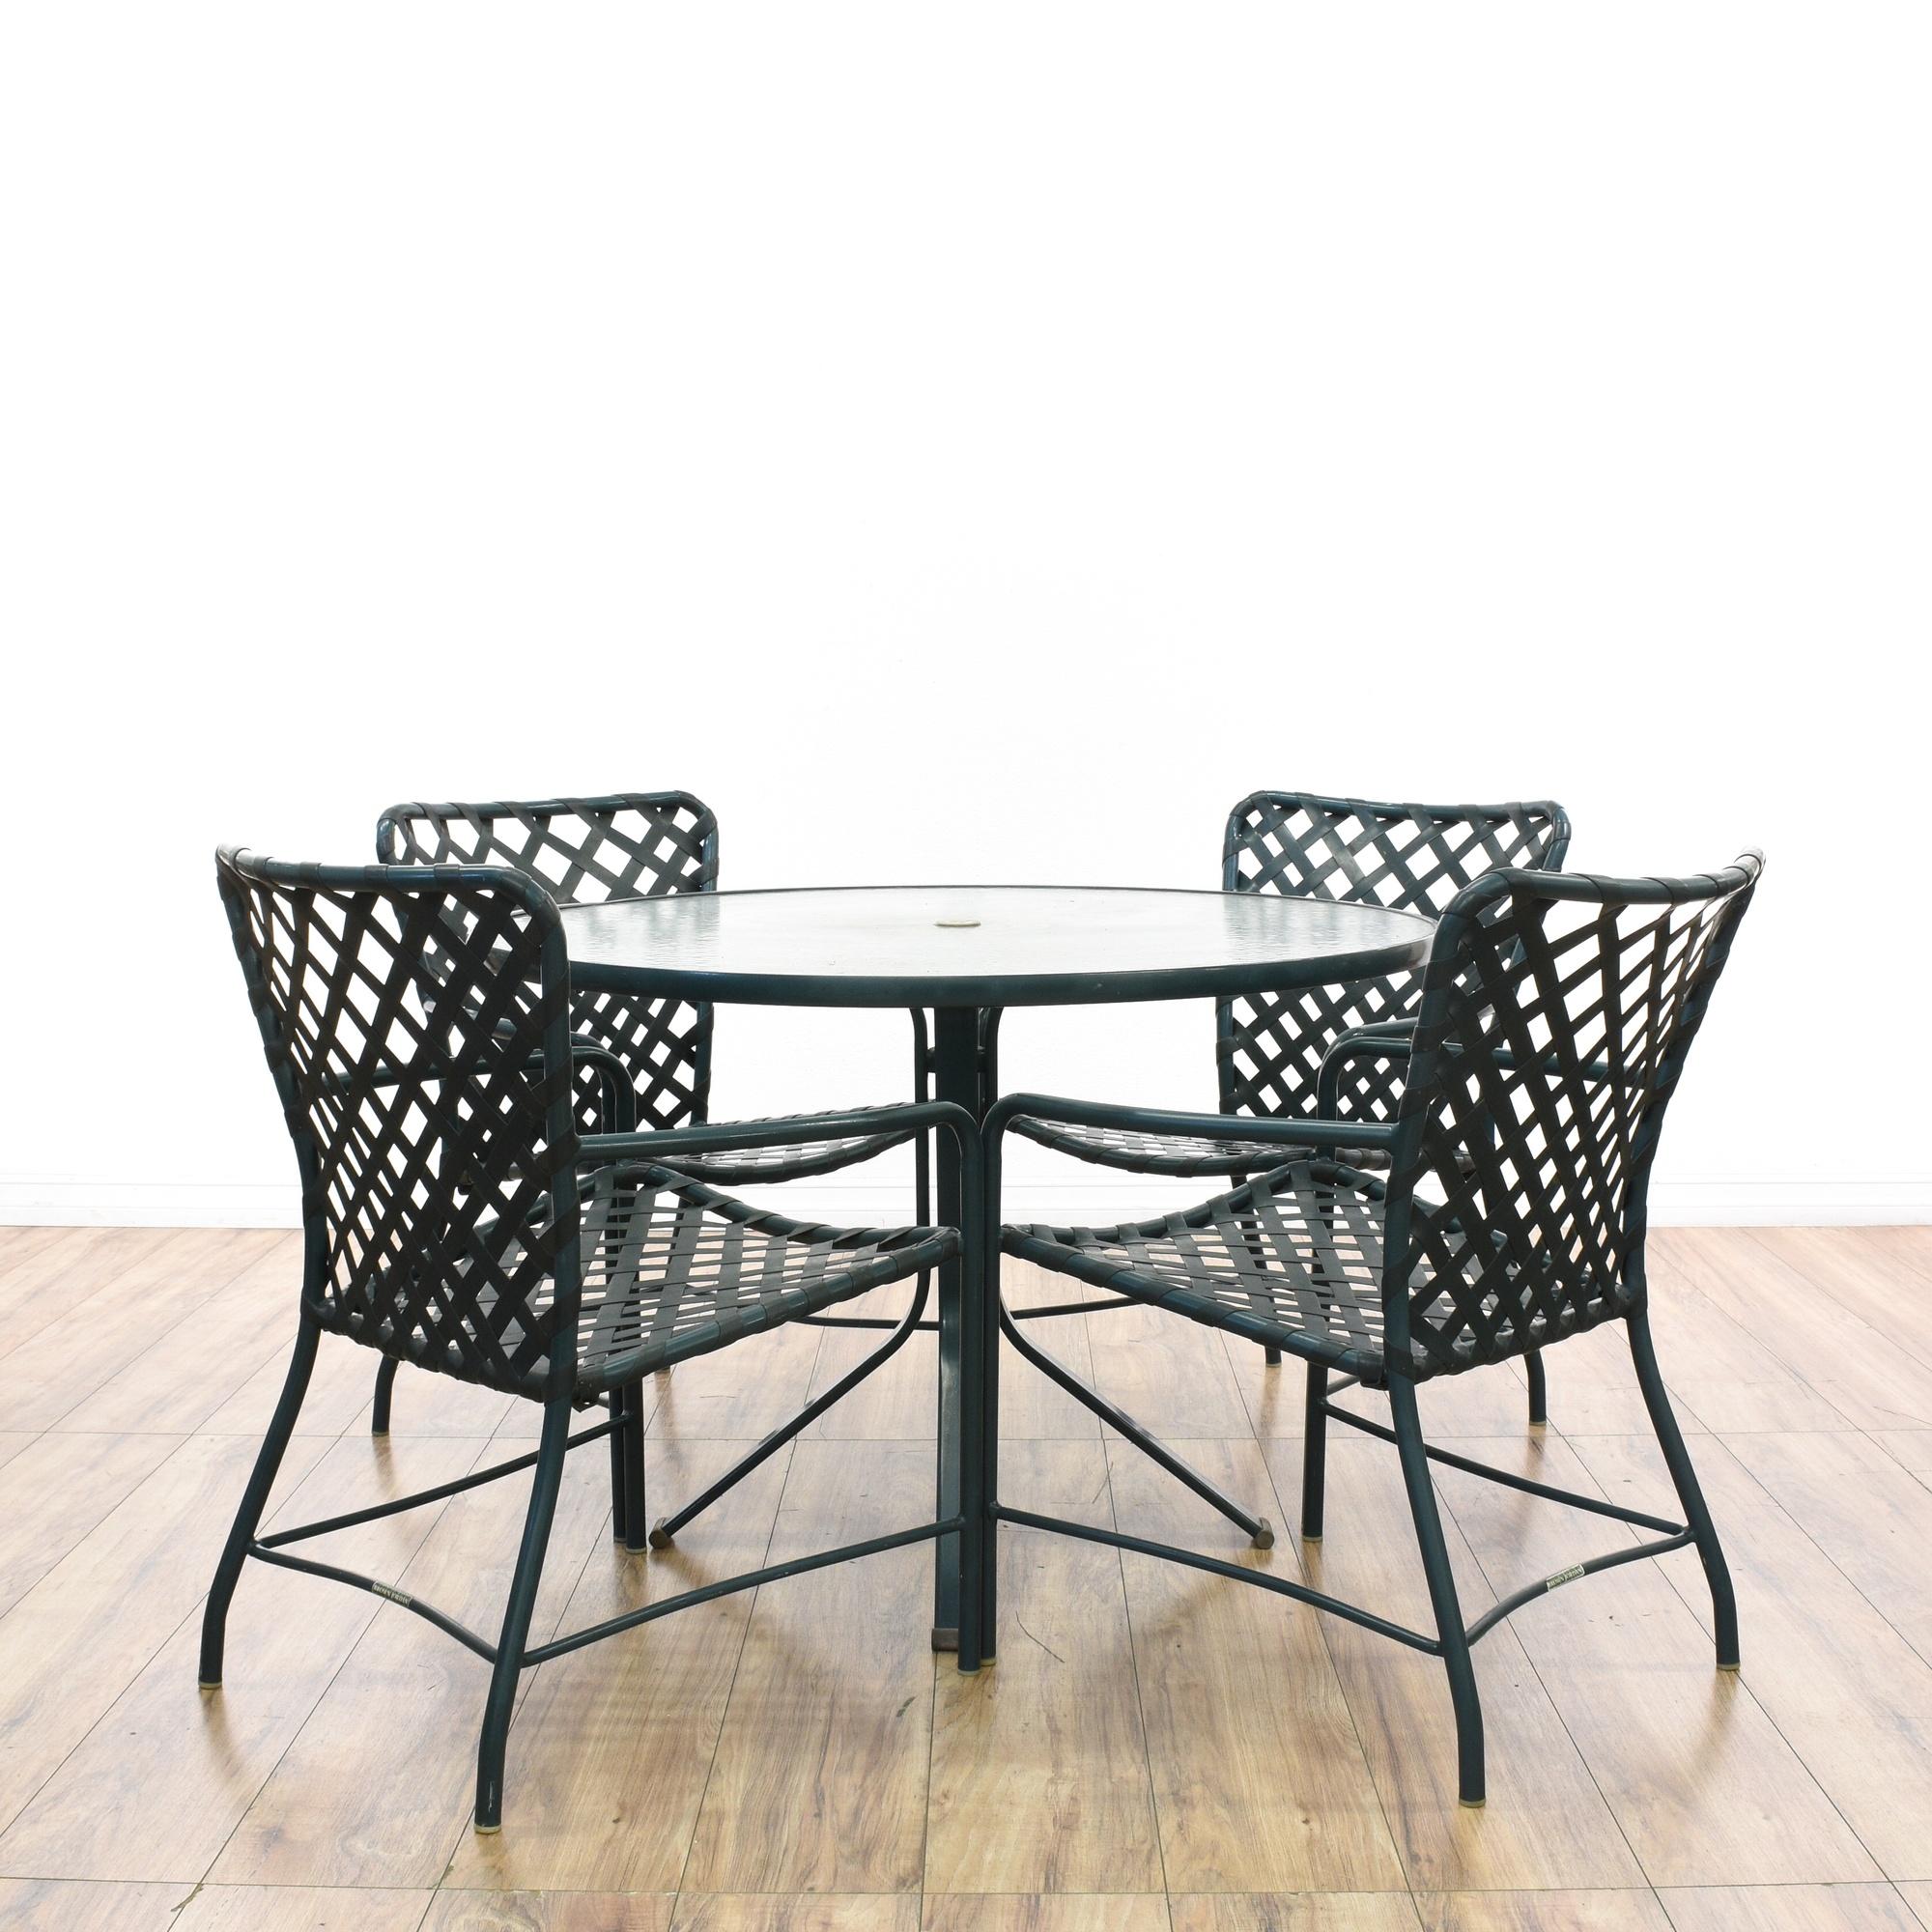 Brown jordan tamiami outdoor patio dining set loveseat for Brown jordan lawn furniture